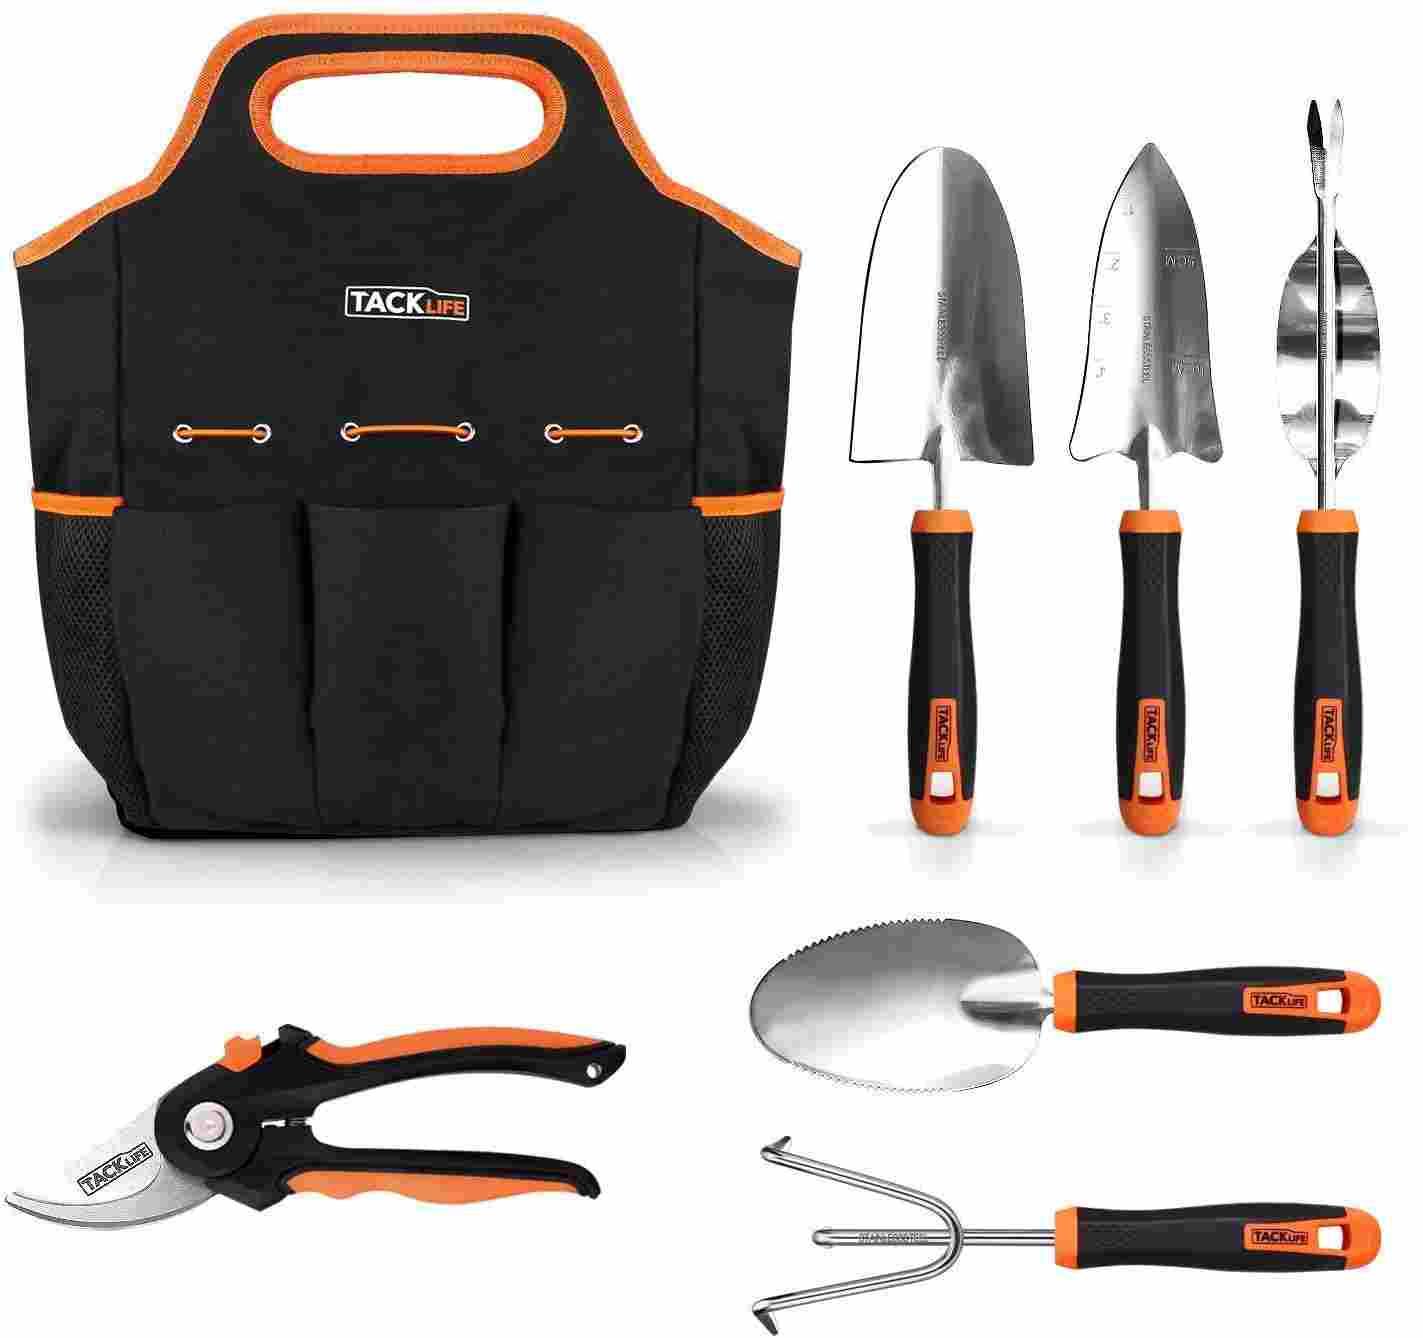 tacklife garden tools